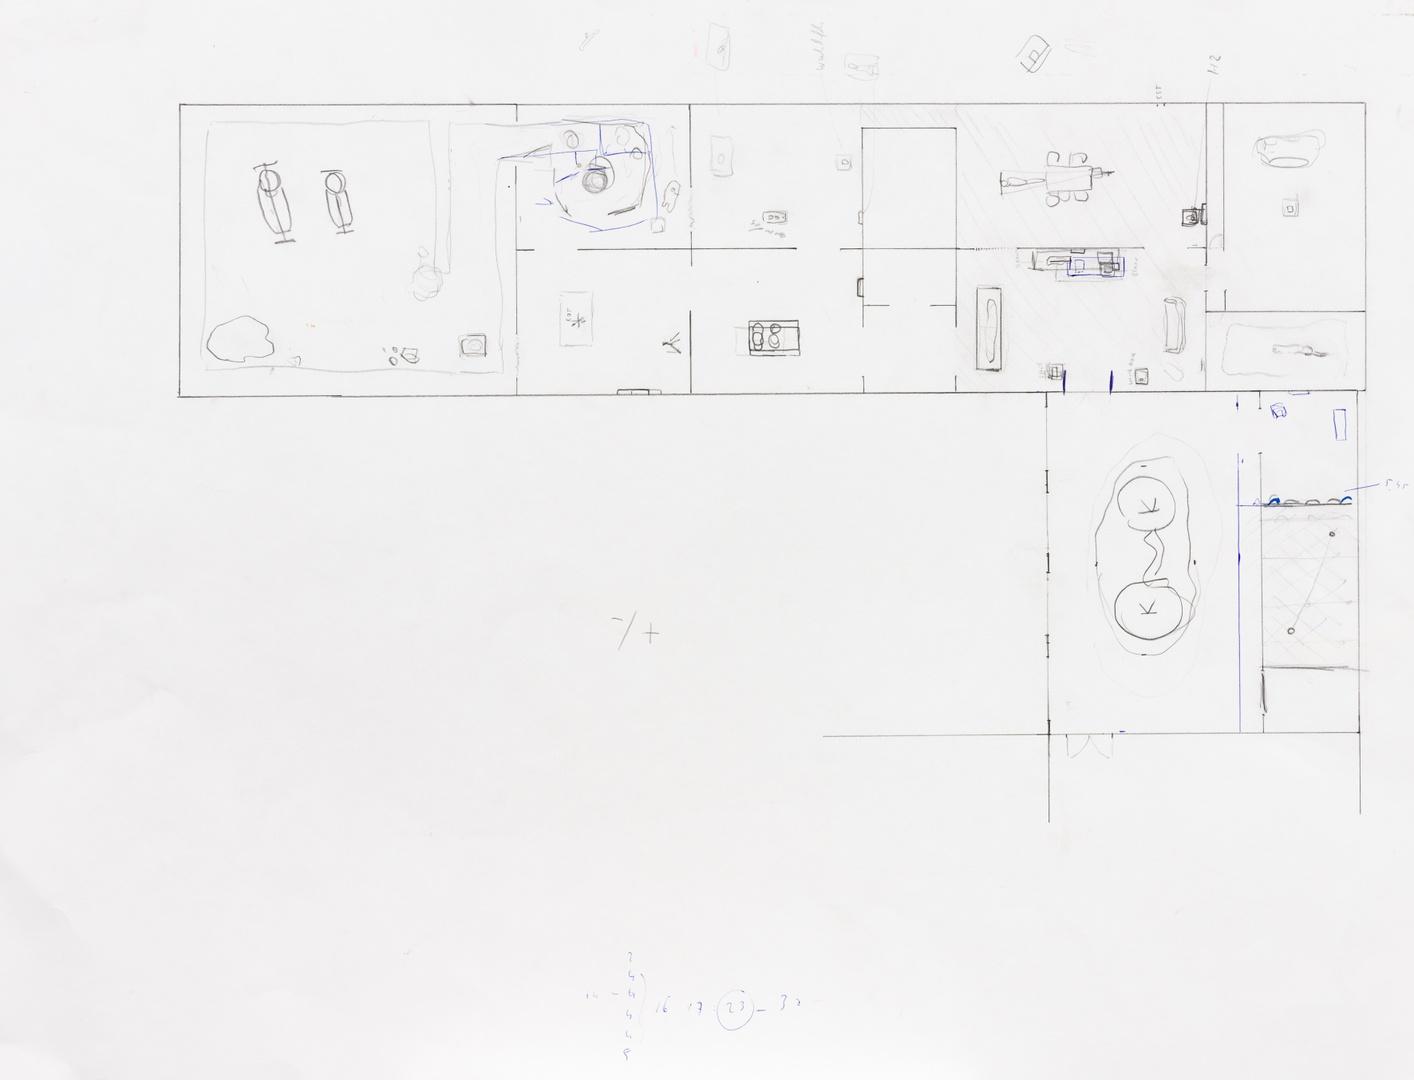 Plattegrond inrichting tentoonstelling Mark Manders